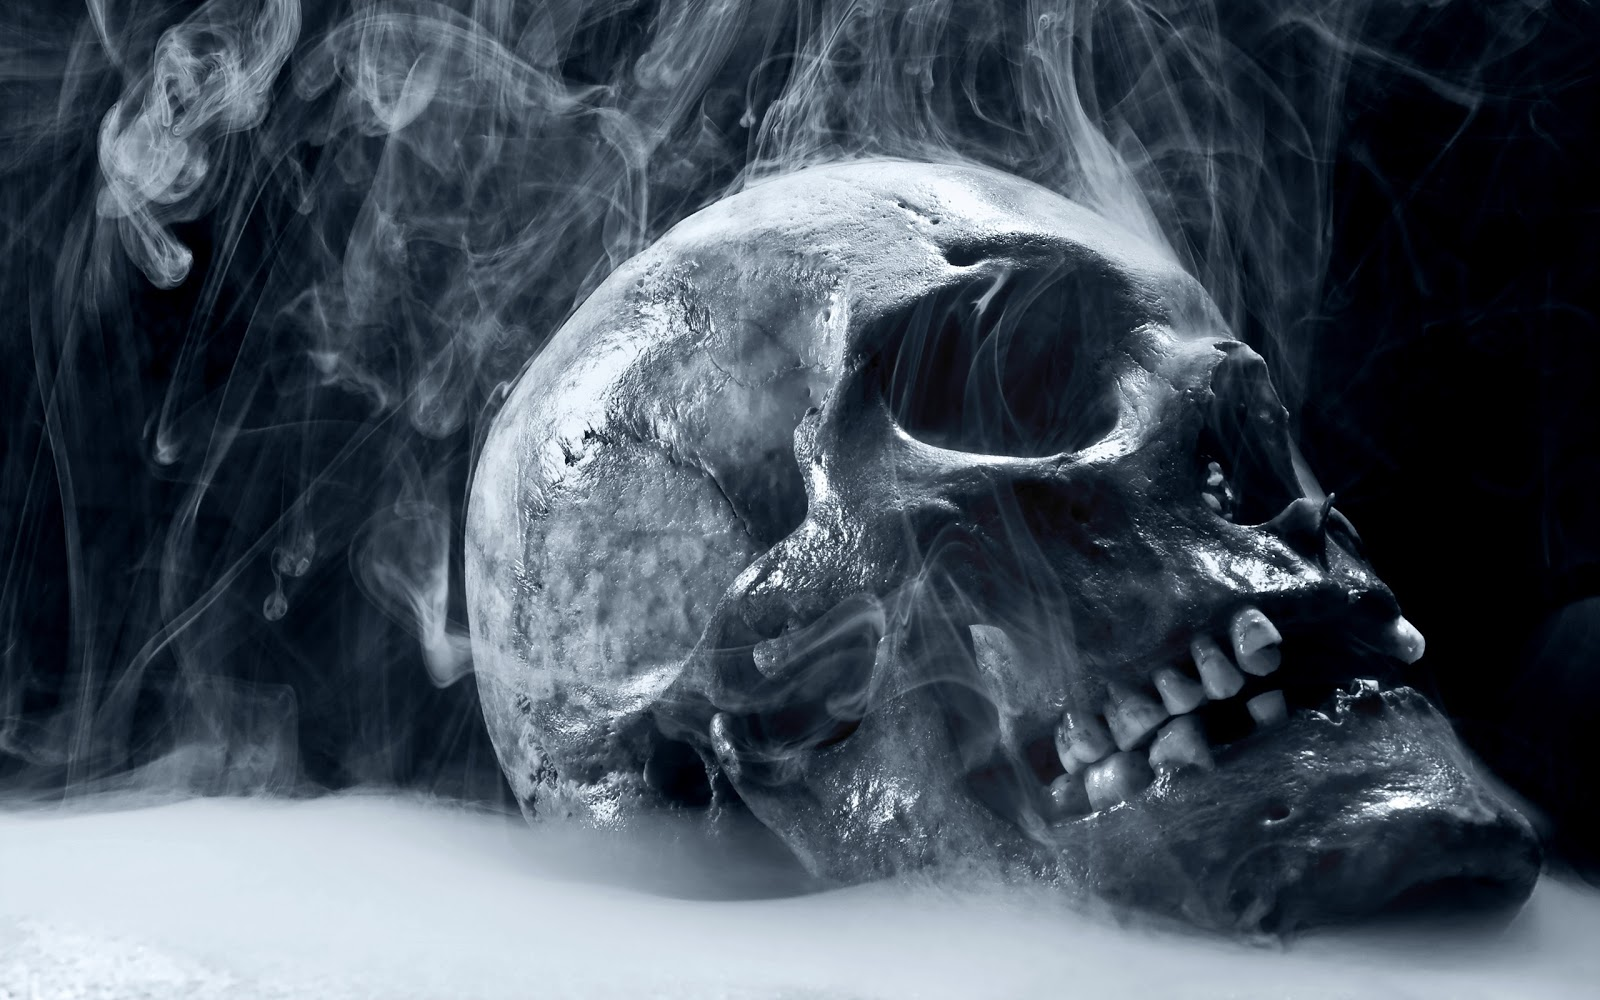 smoke pantyhose awesome Can in you